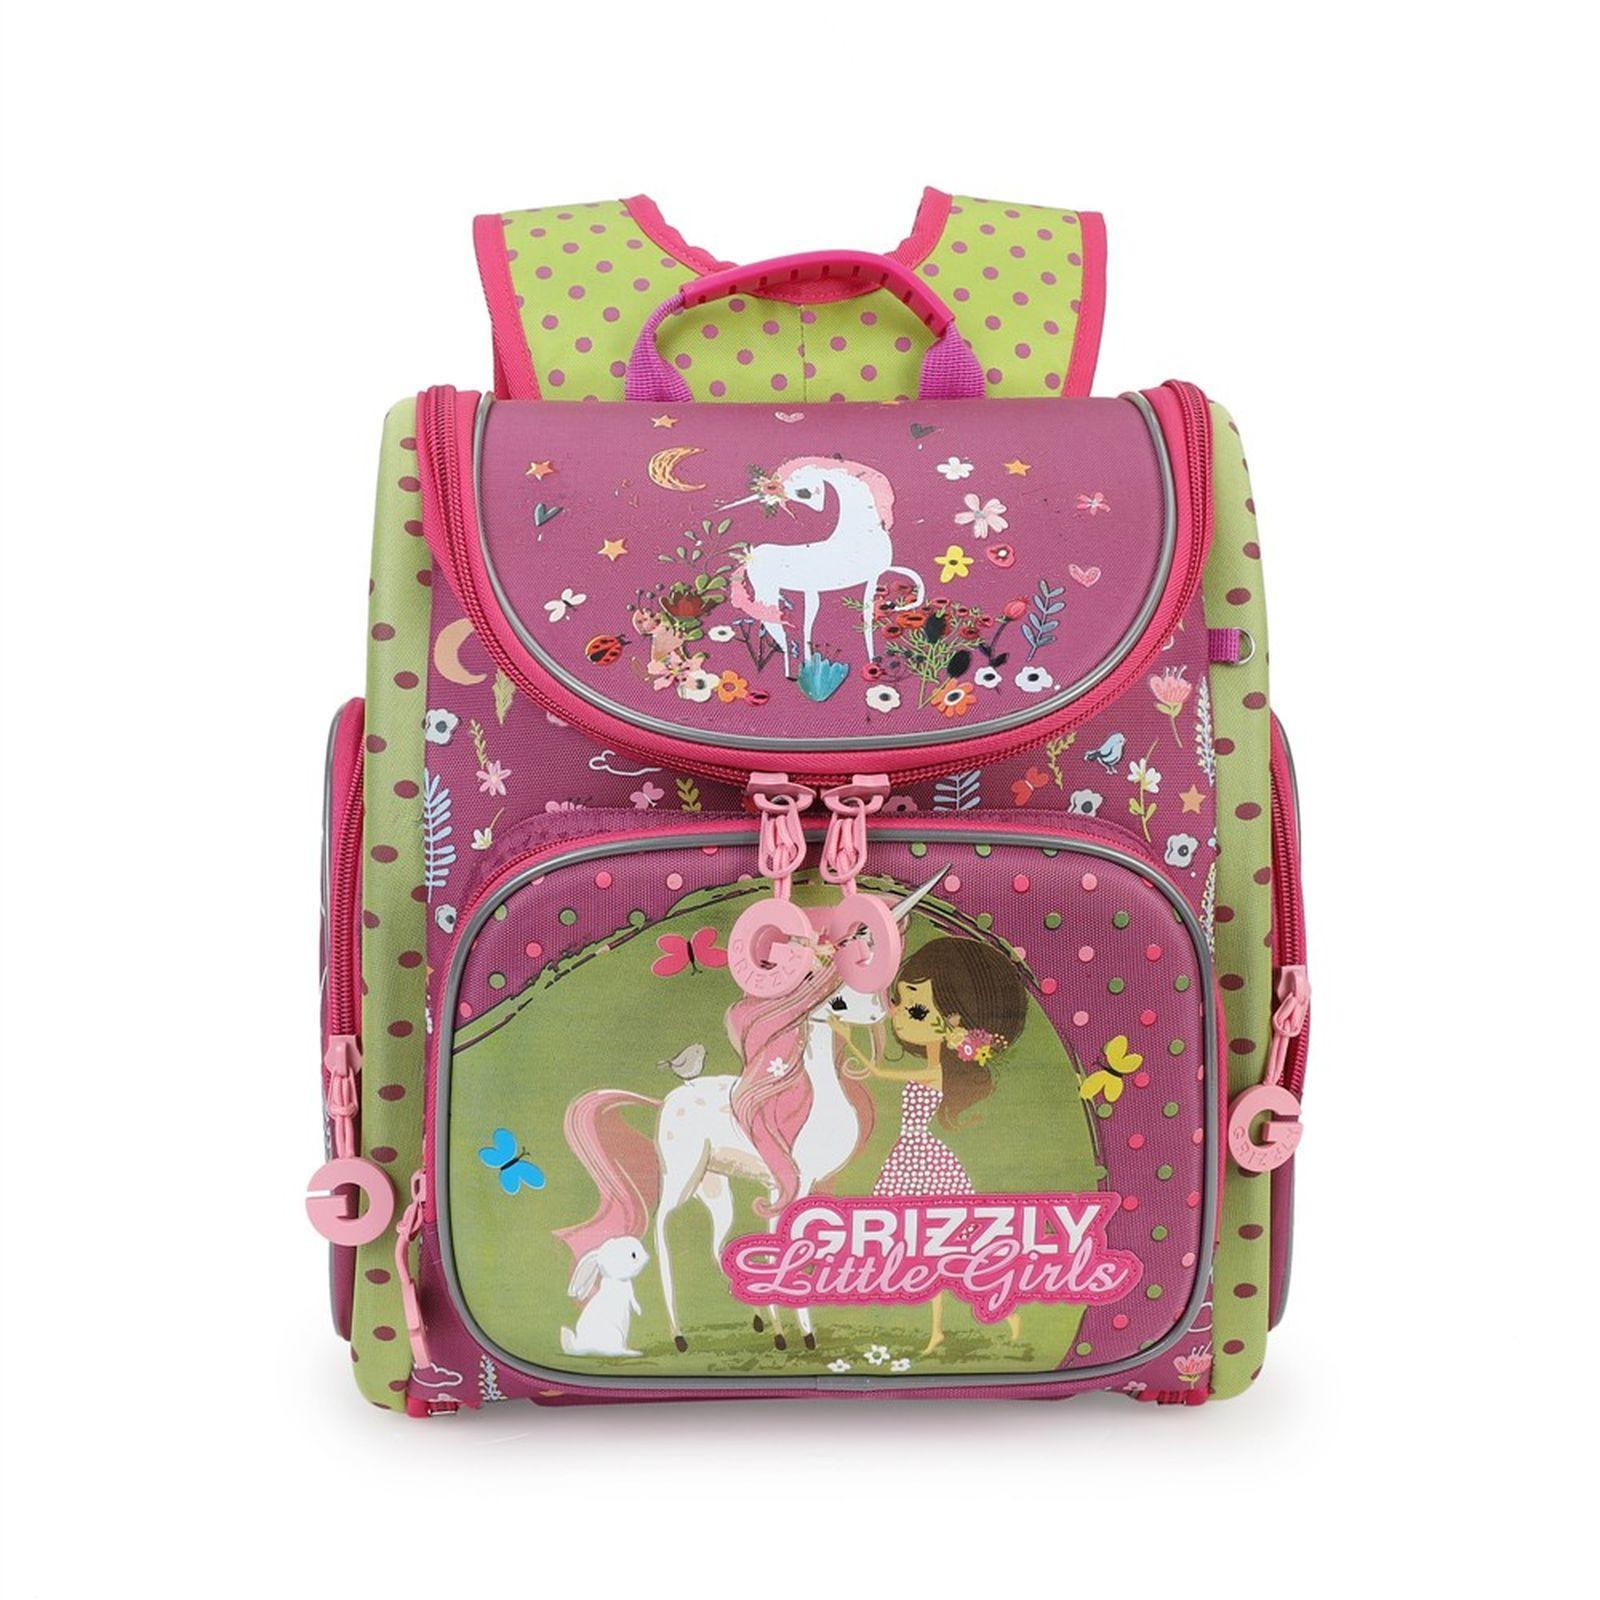 Рюкзак школьный Grizzly, RA-971-1/2, фуксия, салатовый